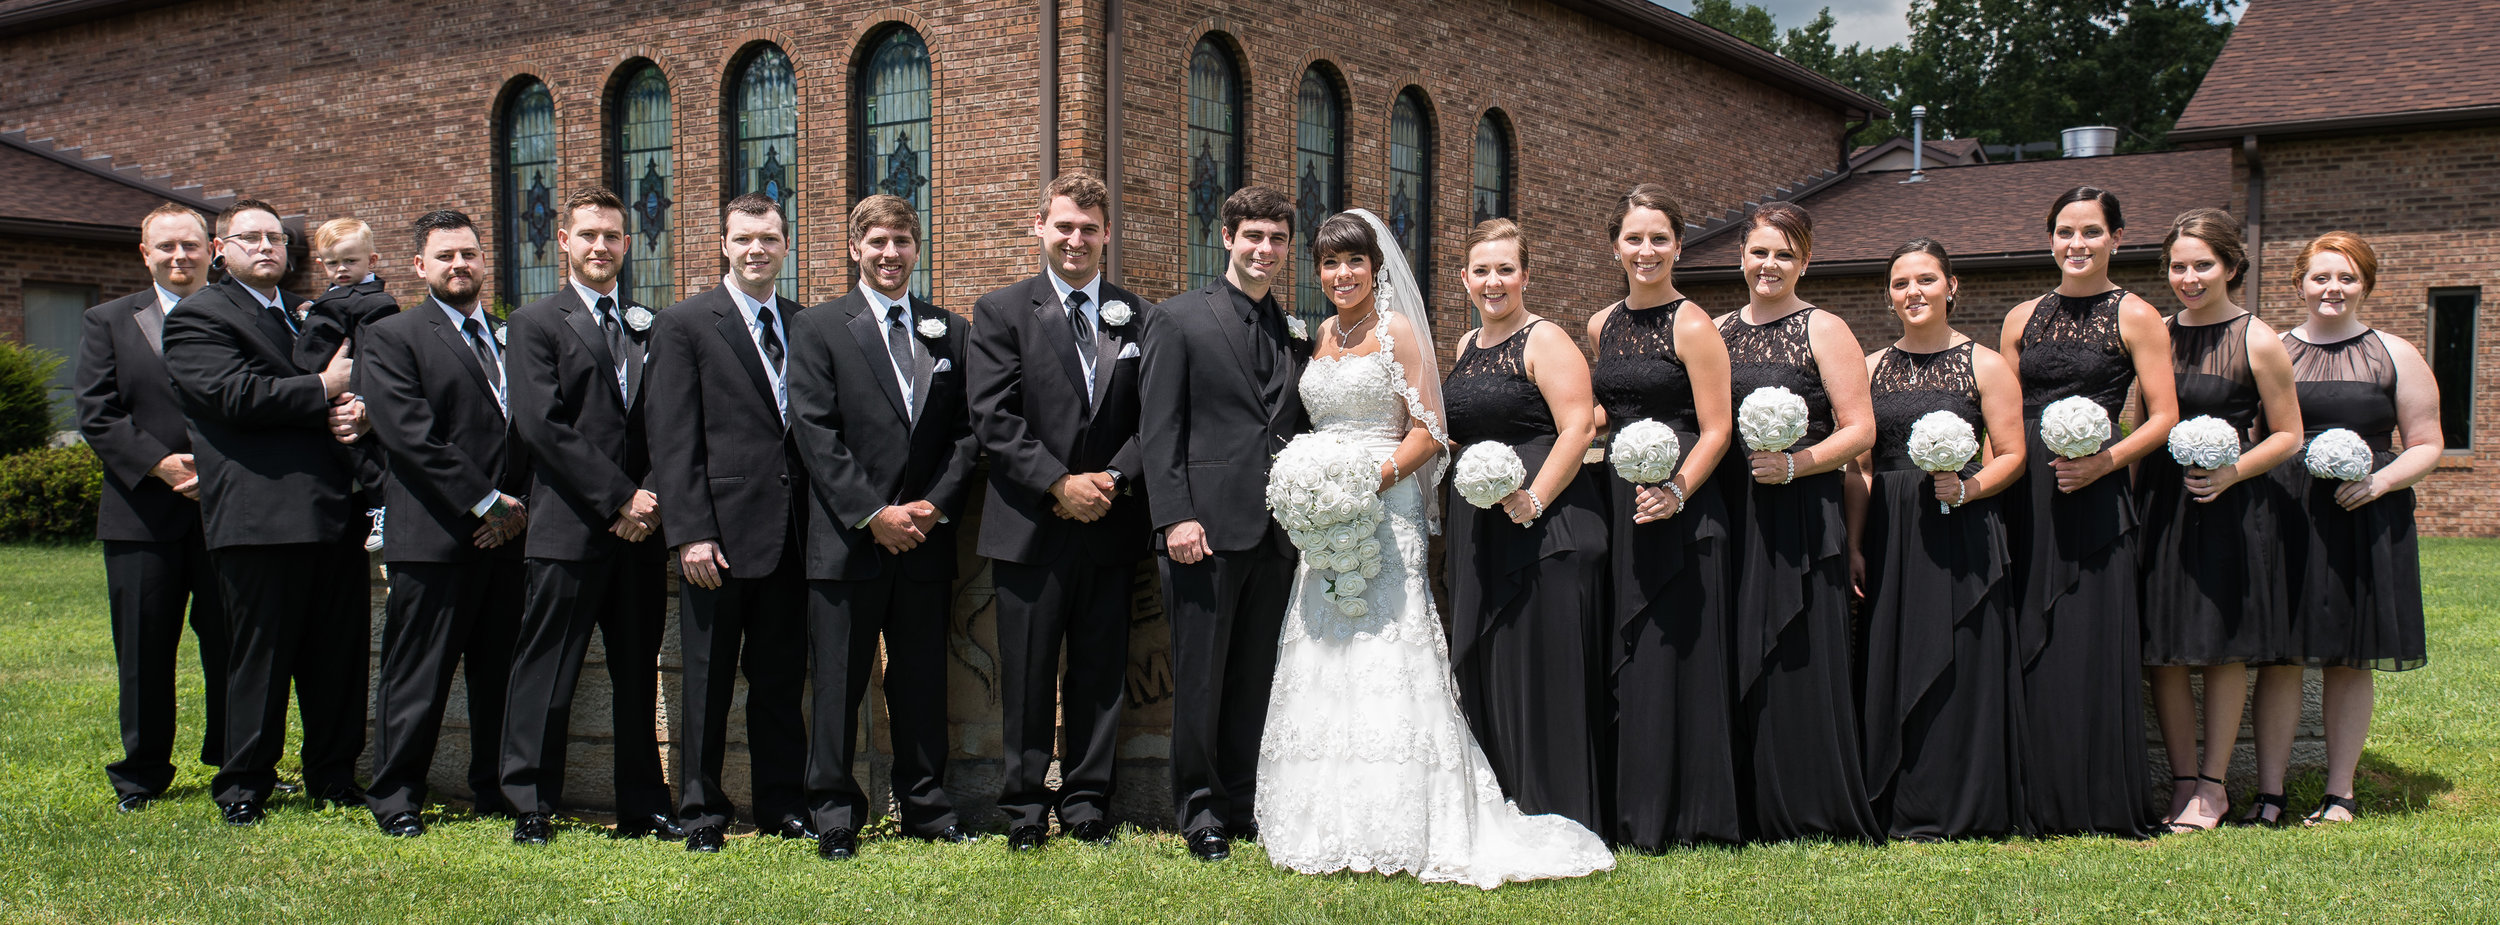 Conner_Wedding_Edits_Web-50.jpg